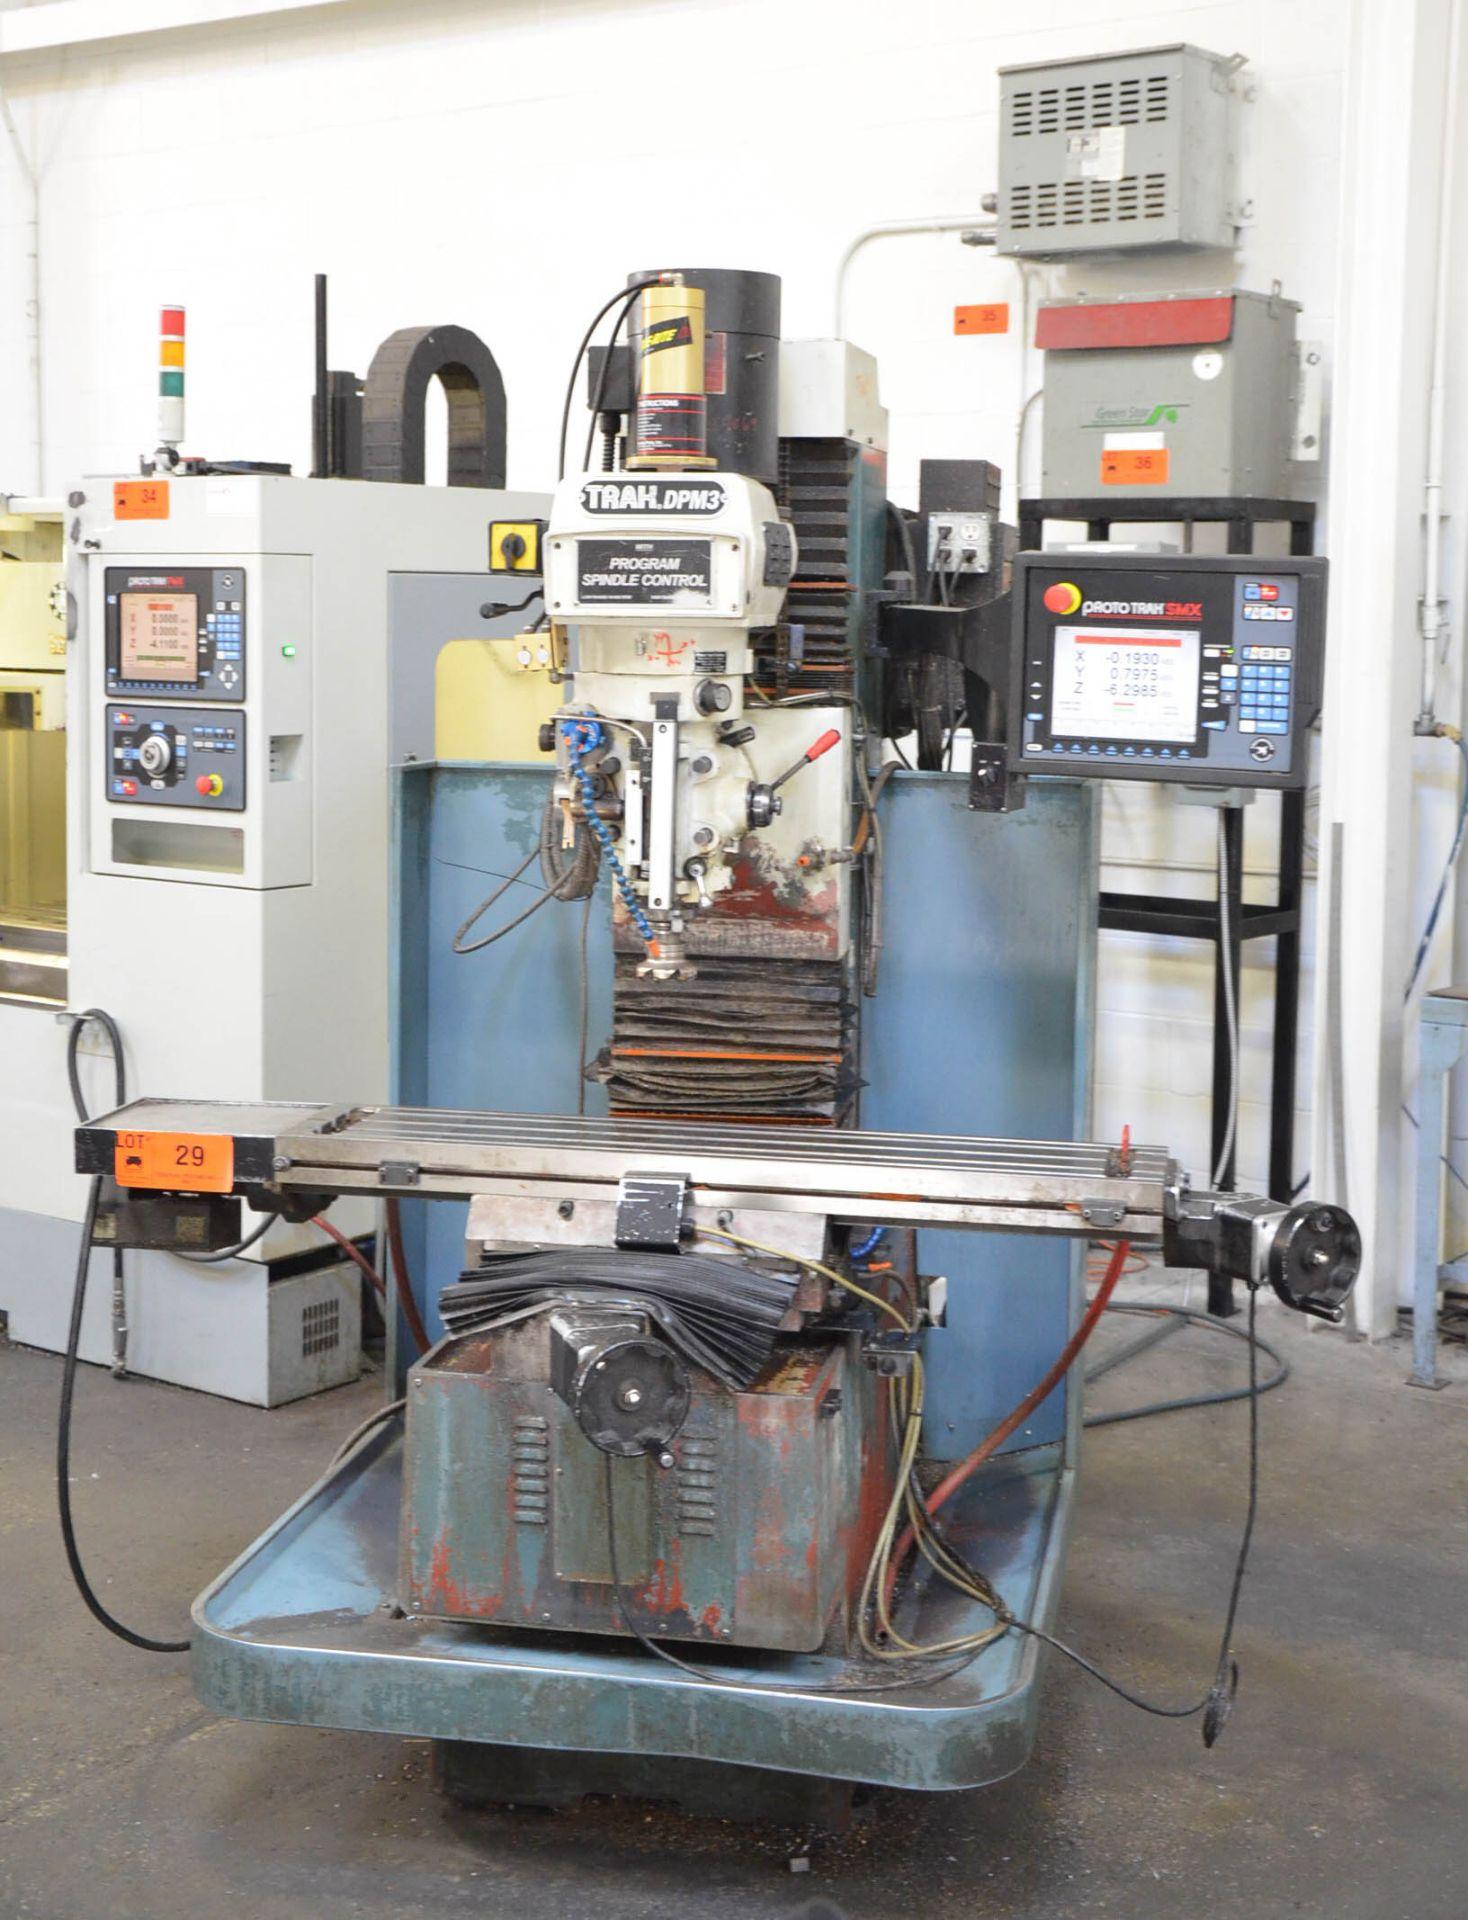 "TRAK DPM3 CNC VERTICAL TURRET MILLING MACHINE WITH PROTO TRAK (2016) SMX CNC CONTROL, 10"" X 50"" - Image 2 of 10"